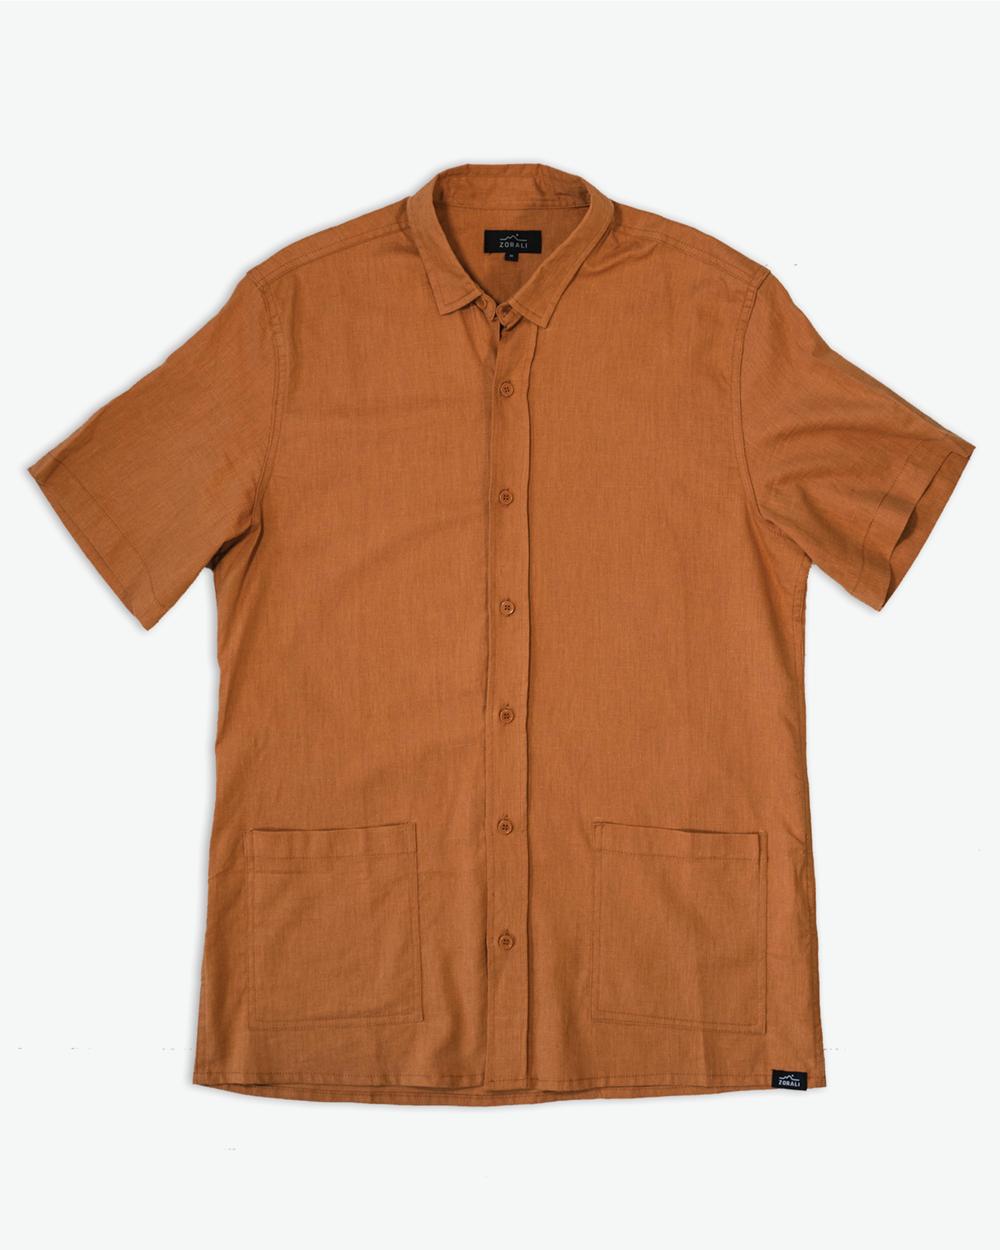 Zorali-Hemp-Shirt-Ginger.png